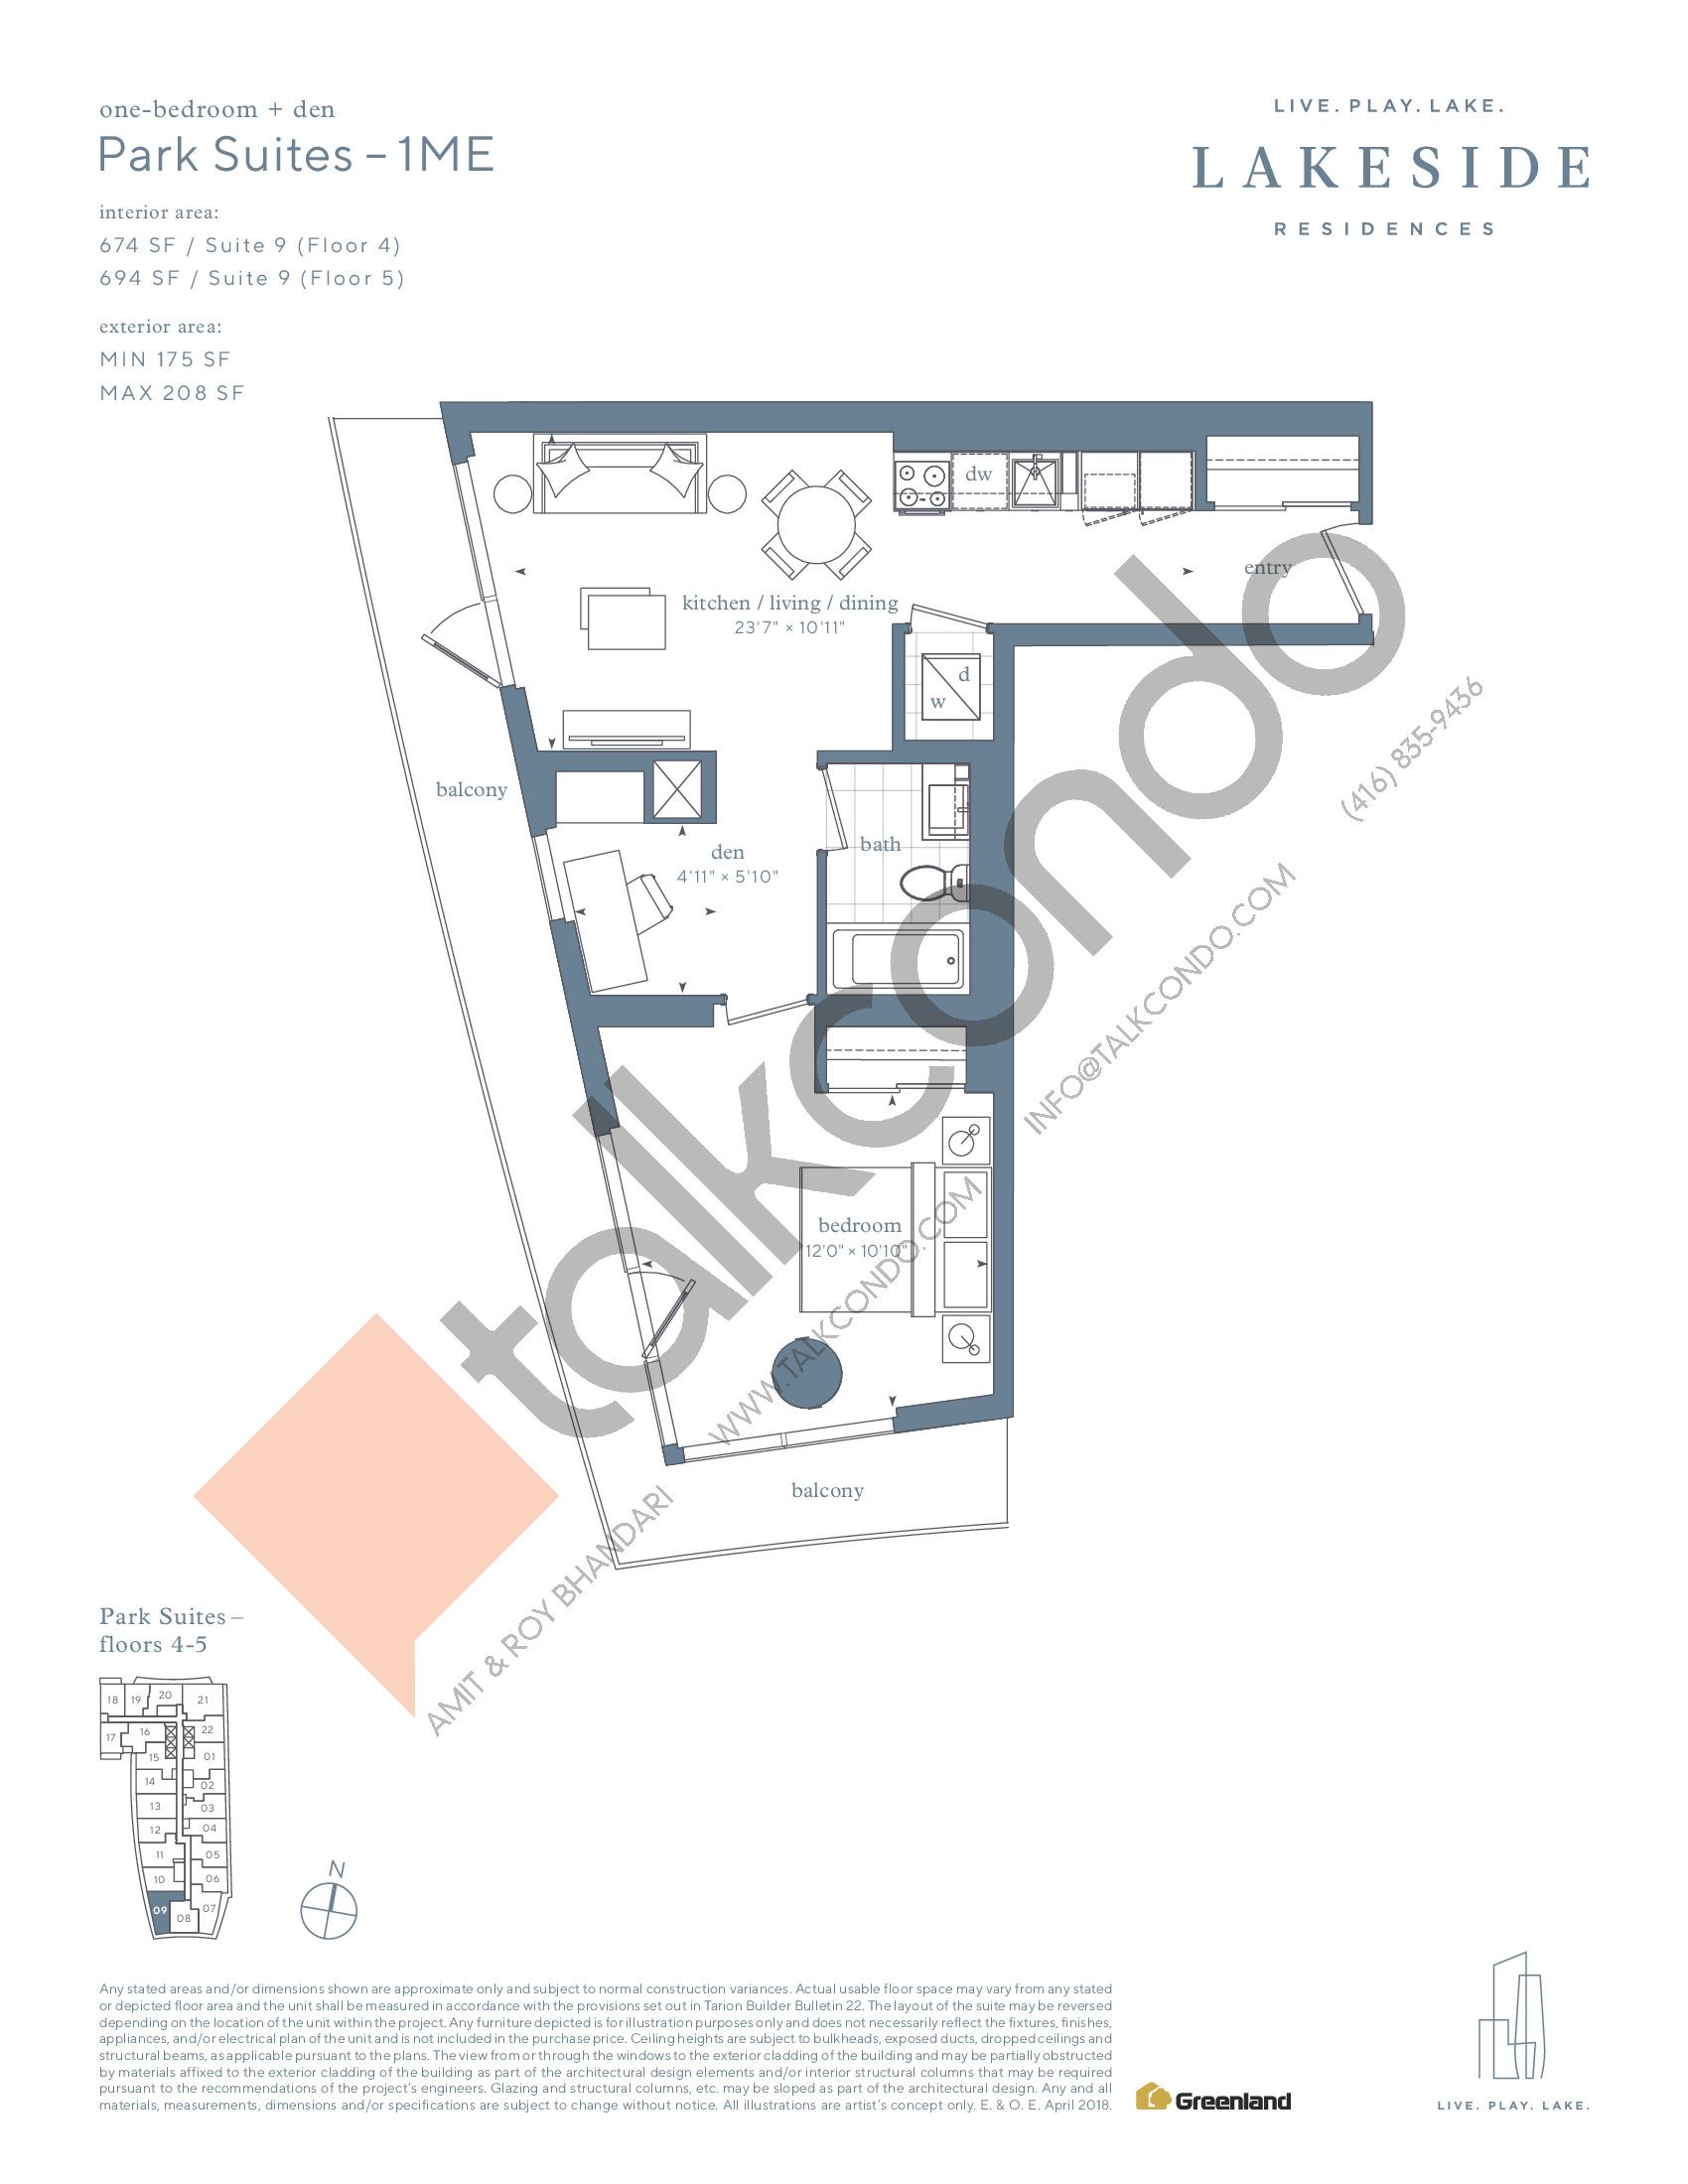 Park Suites - 1ME Floor Plan at Lakeside Residences - 694 sq.ft